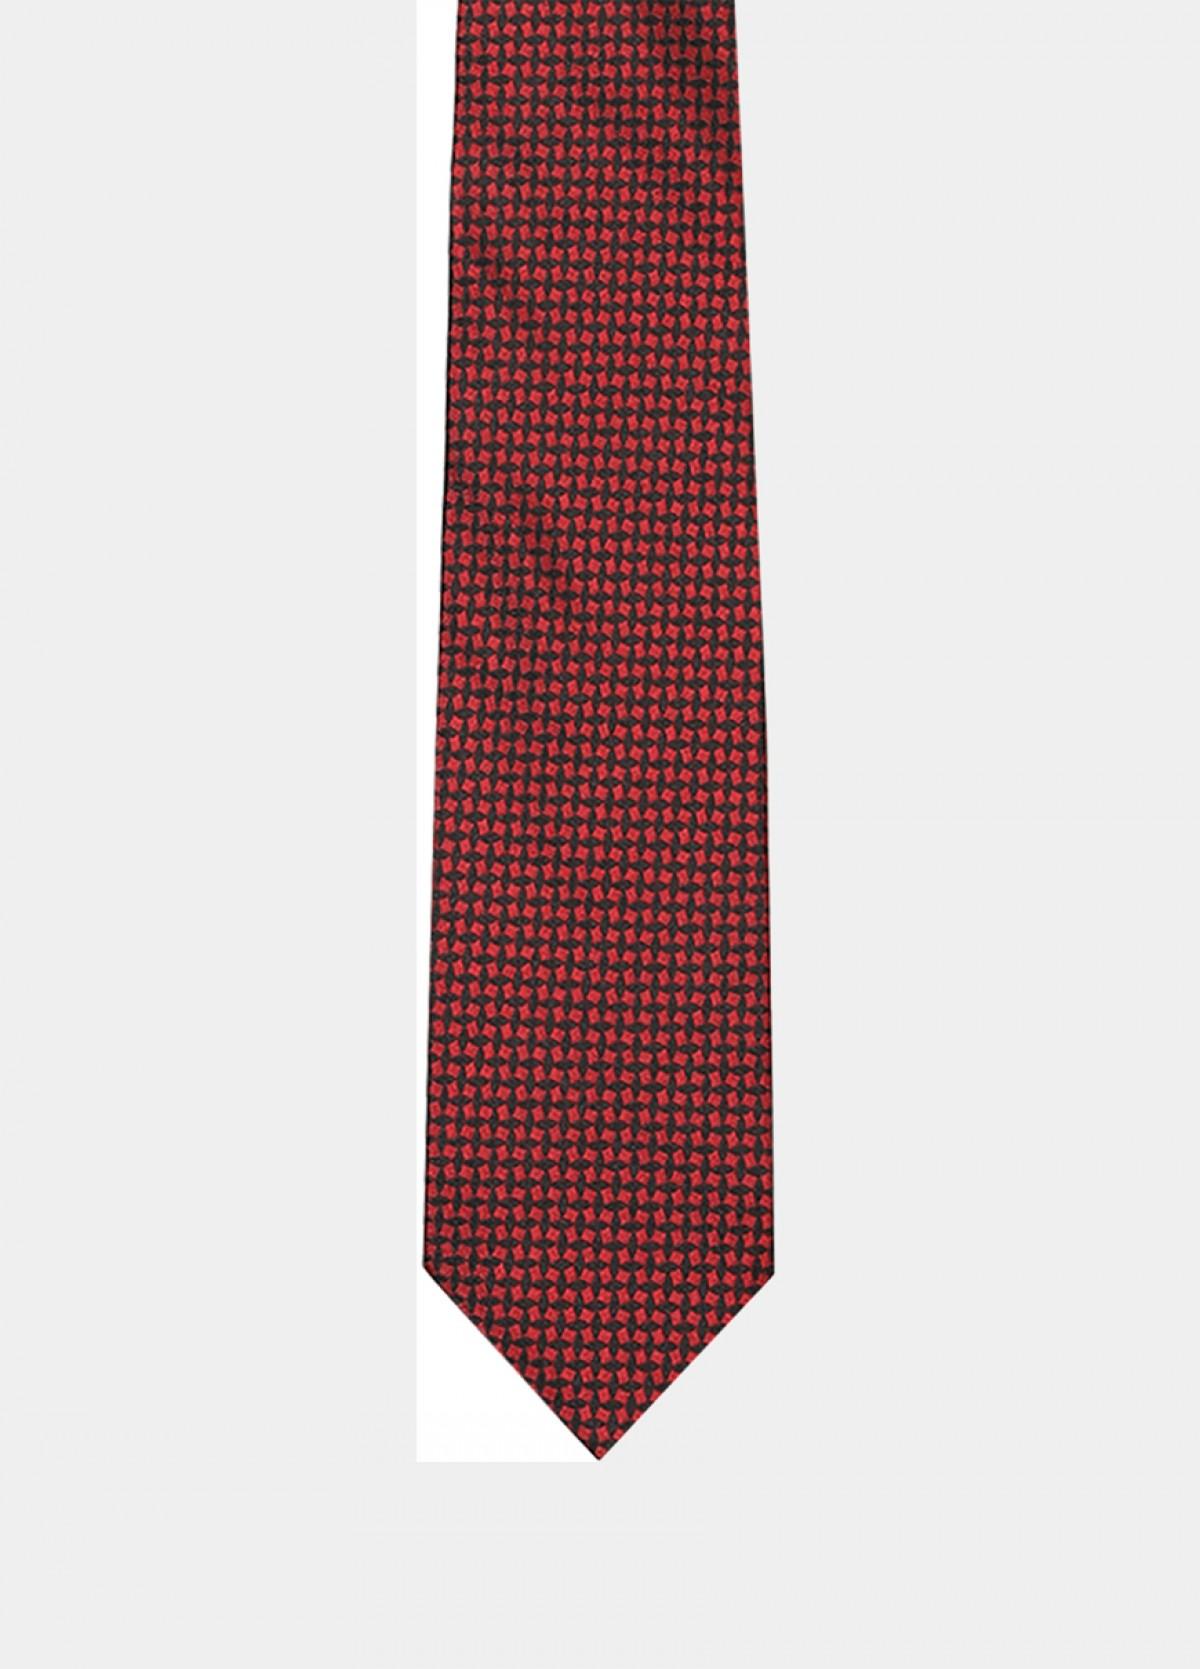 The Black Stain Resistant Tie